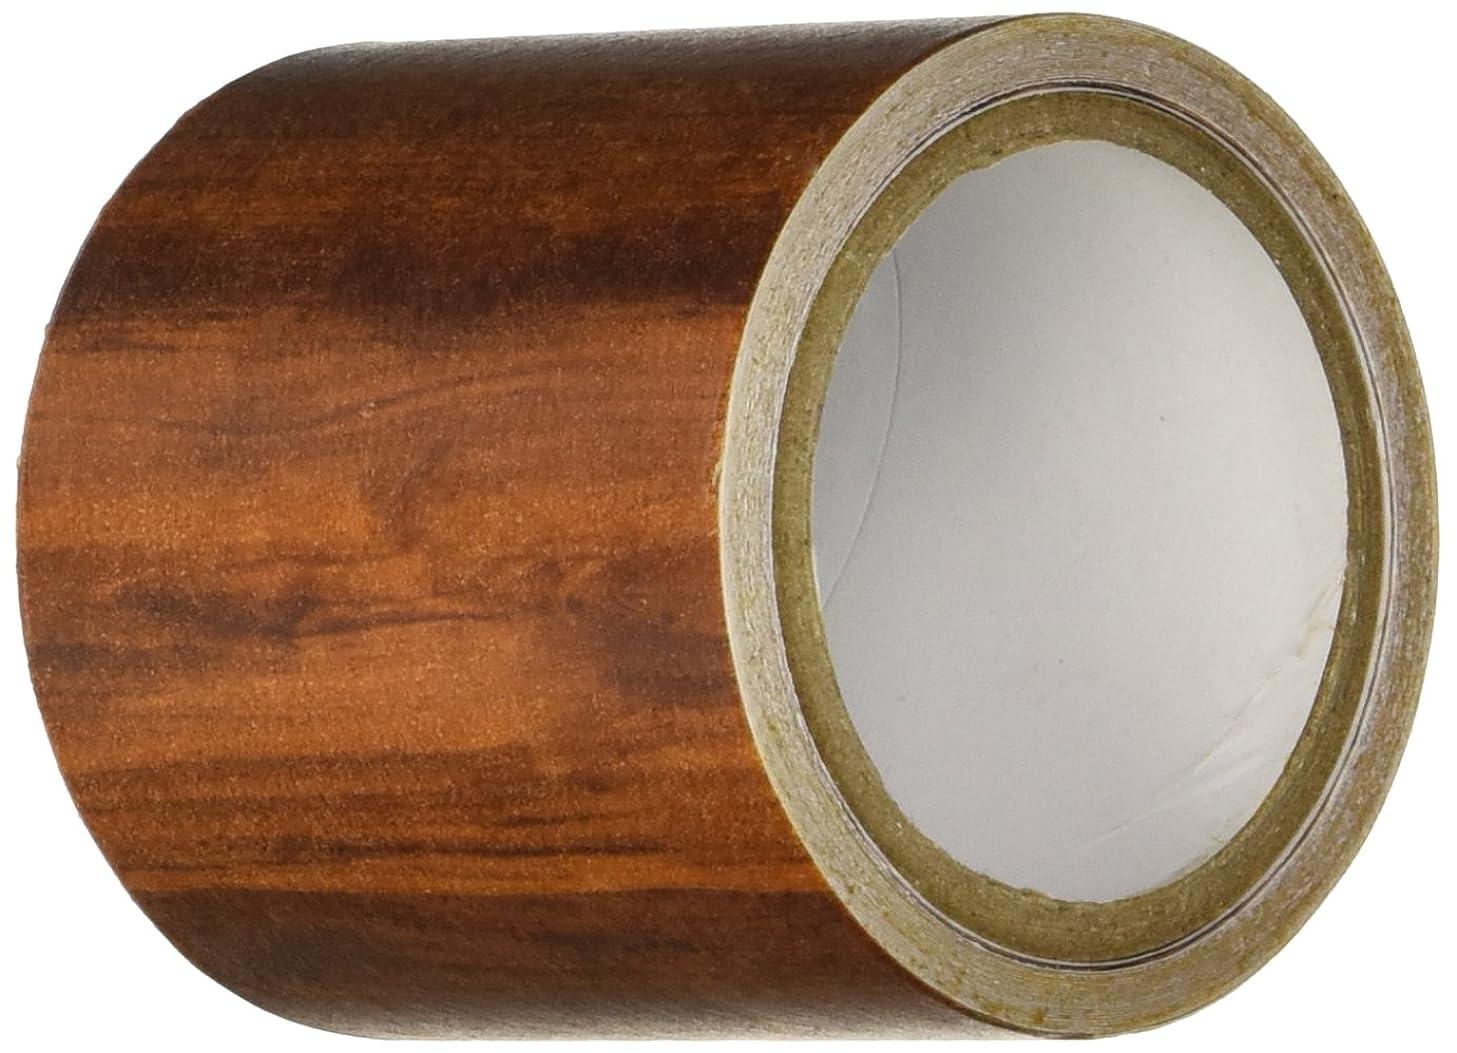 American Crafts 312878 Heidi Swapp Lightbox Woodgrain 2 Inch 3 Yards Tape